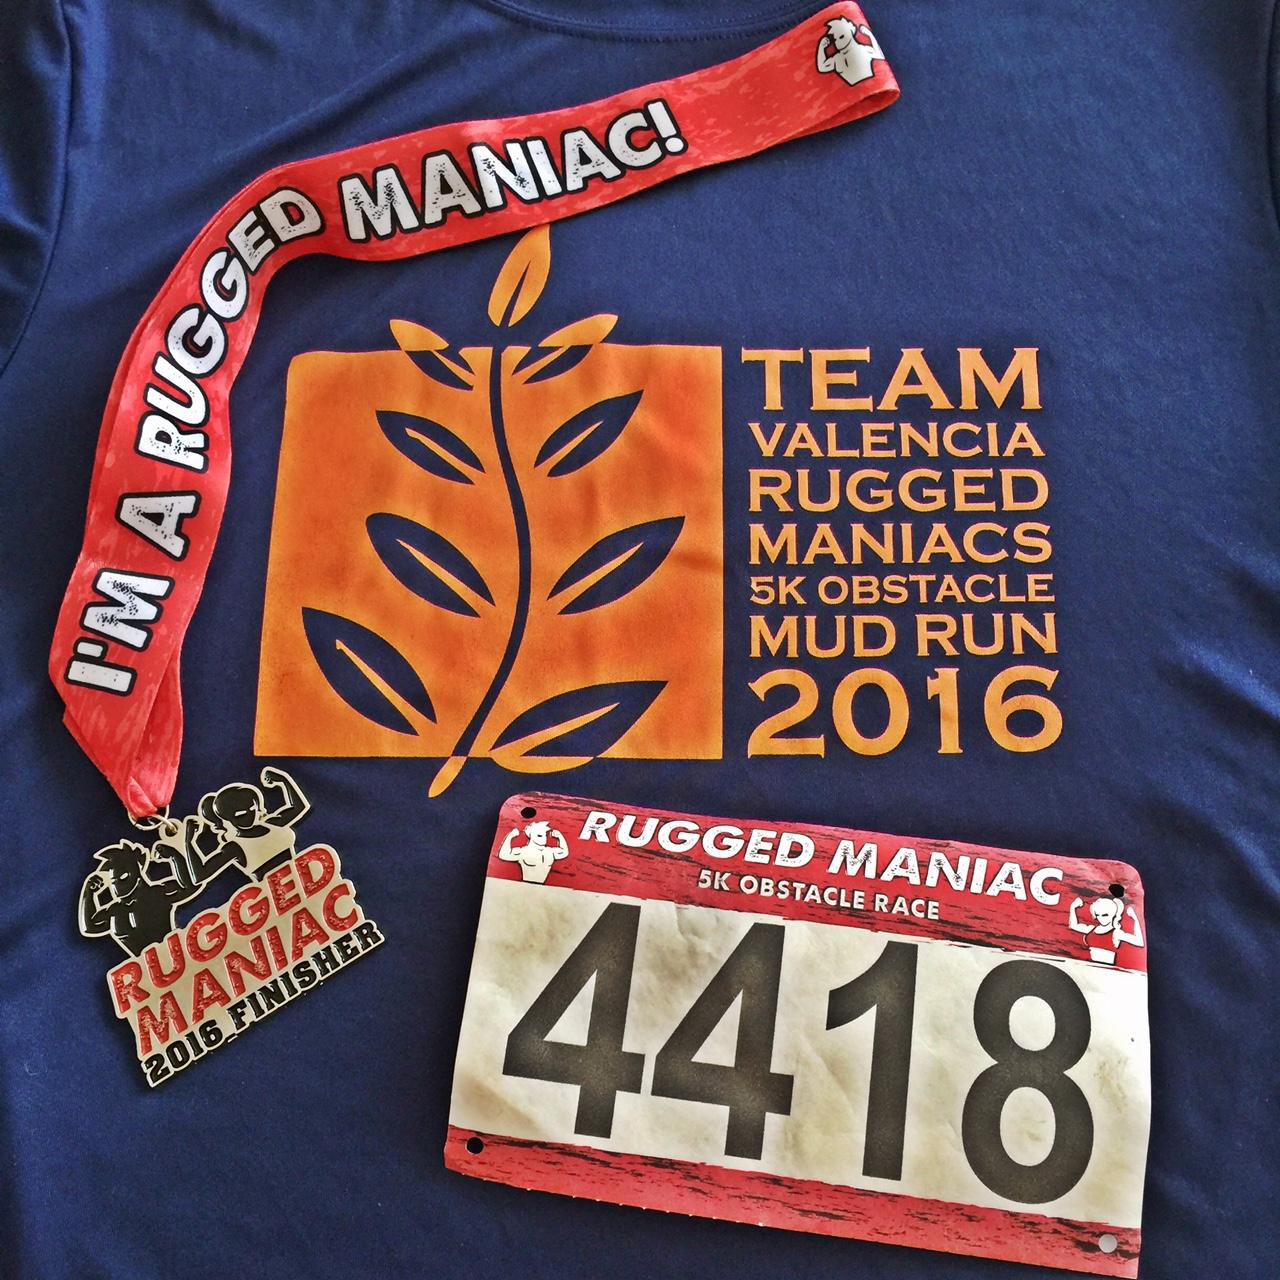 Rugged Maniac Race Www Fitwithliss Com